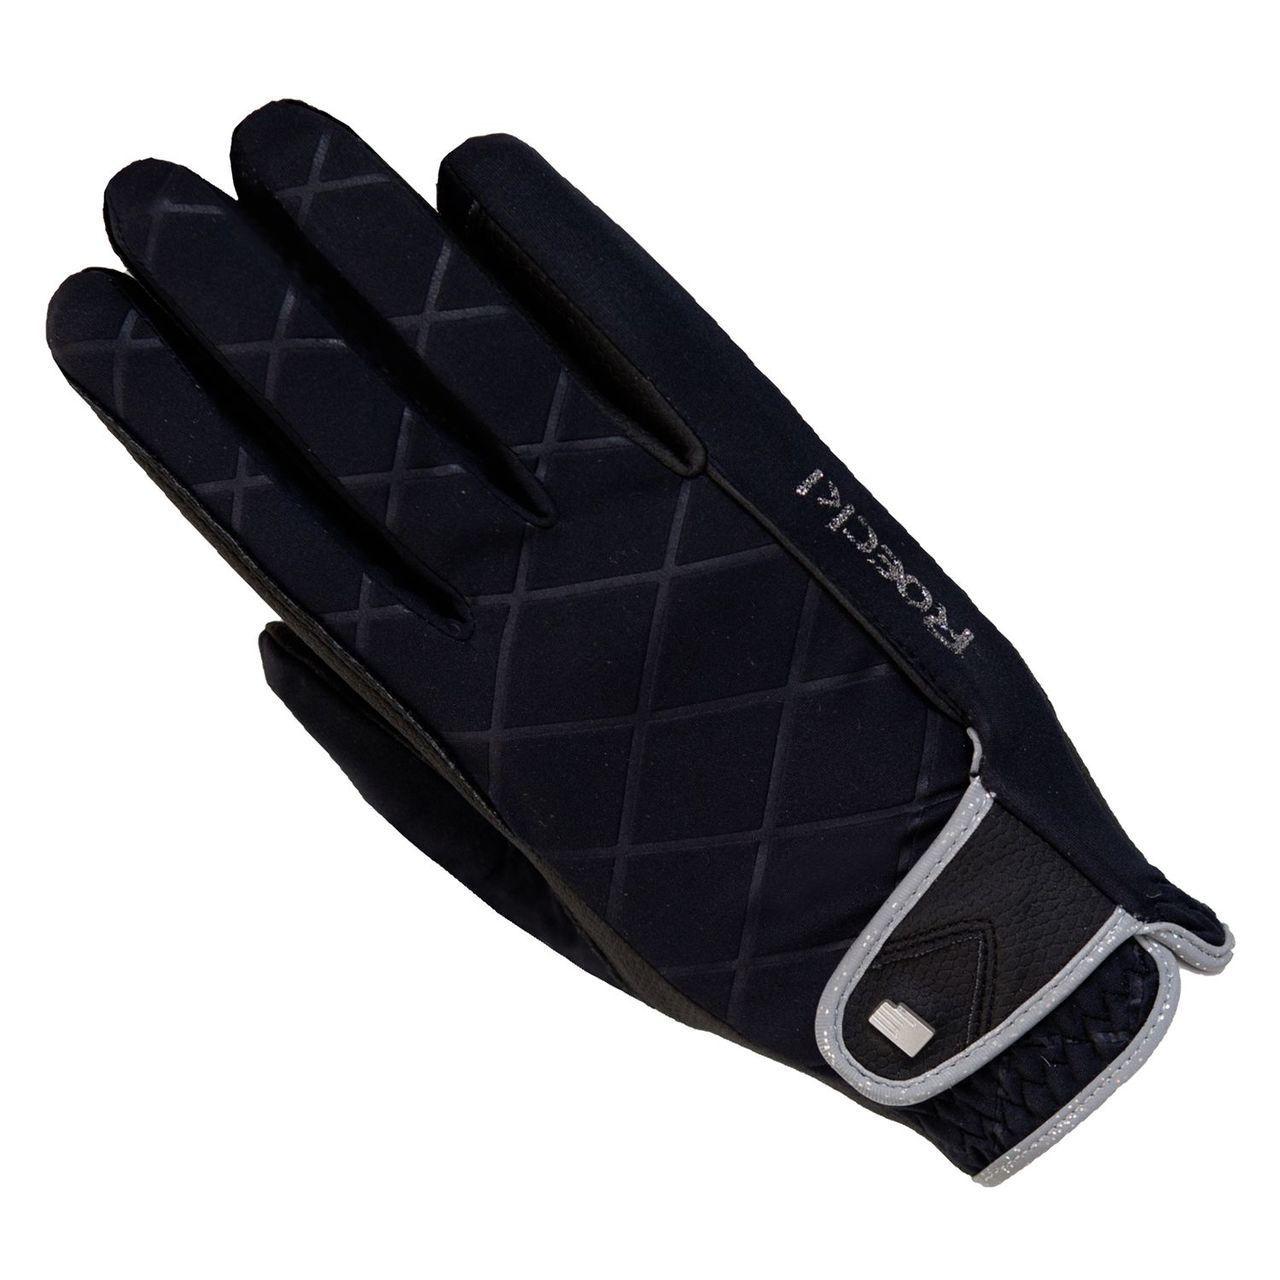 Roeckl Sports Julia Gloves